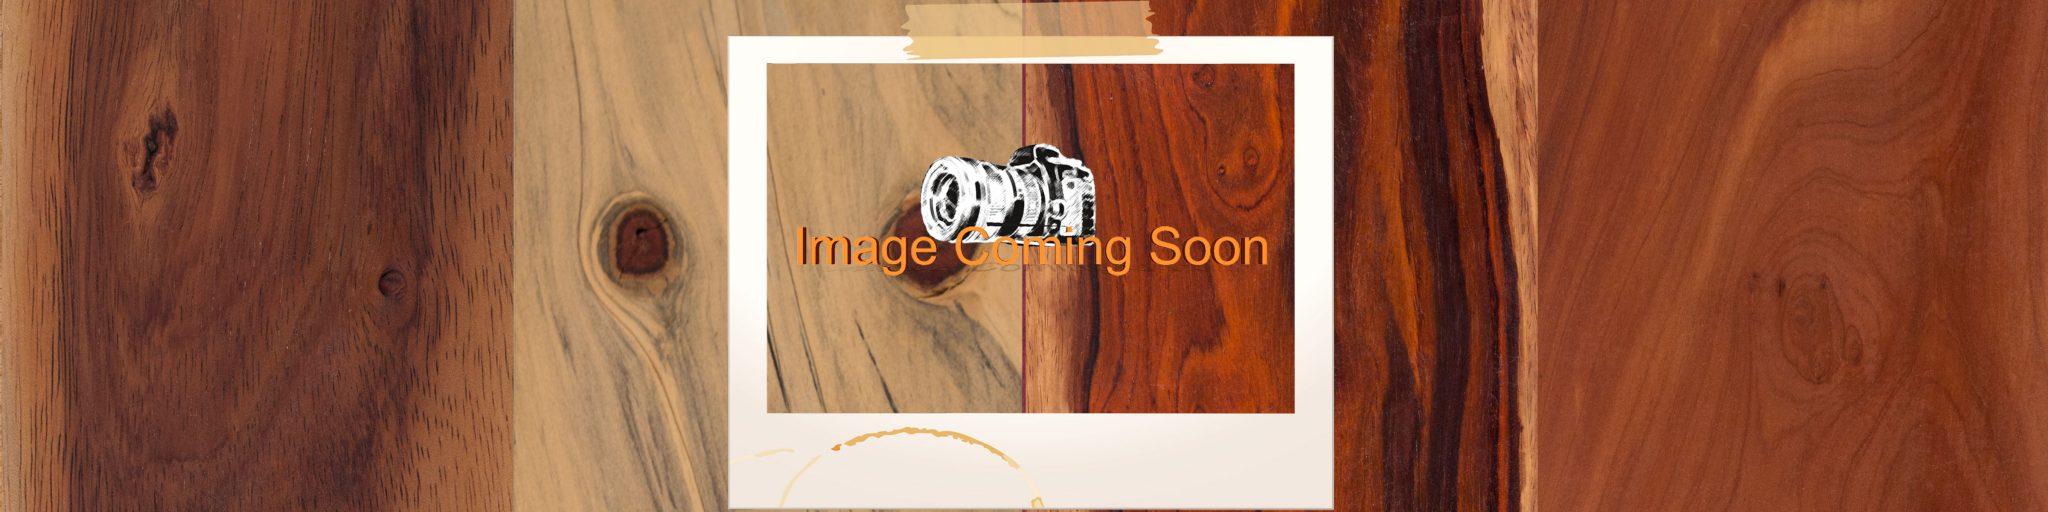 Wholesale Bolivian Rosewood Hardwood Flooring